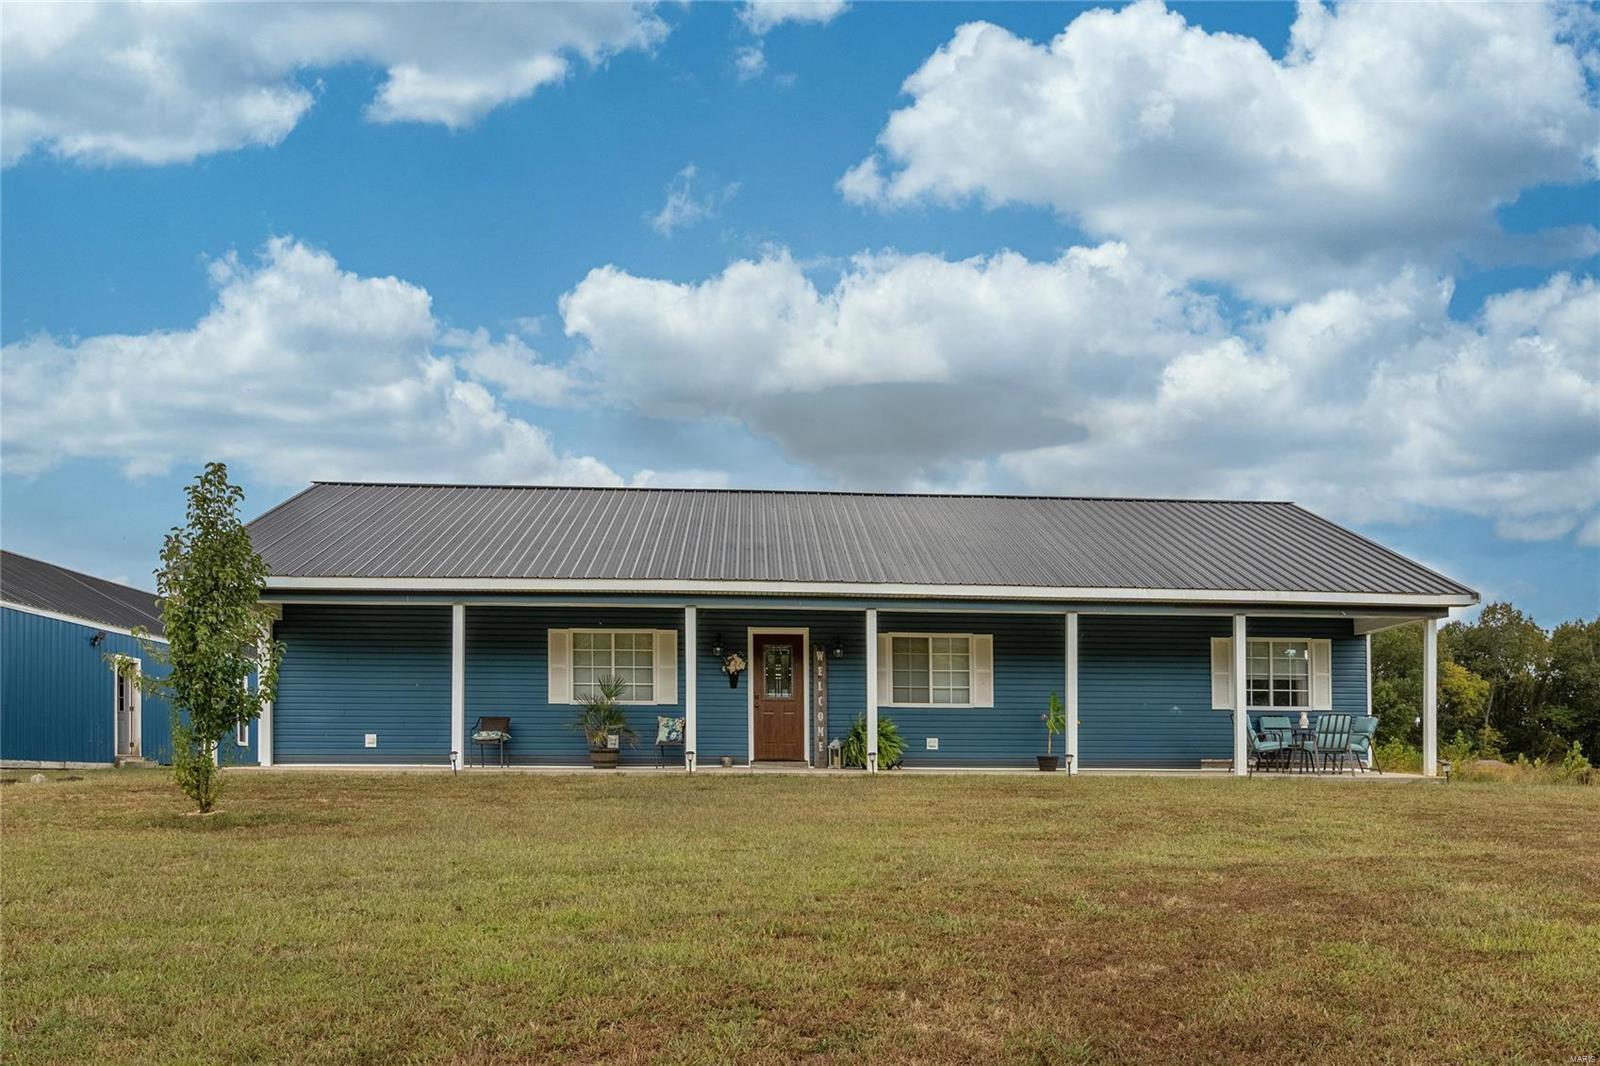 1601 Bates Road Property Photo - Ava, IL real estate listing